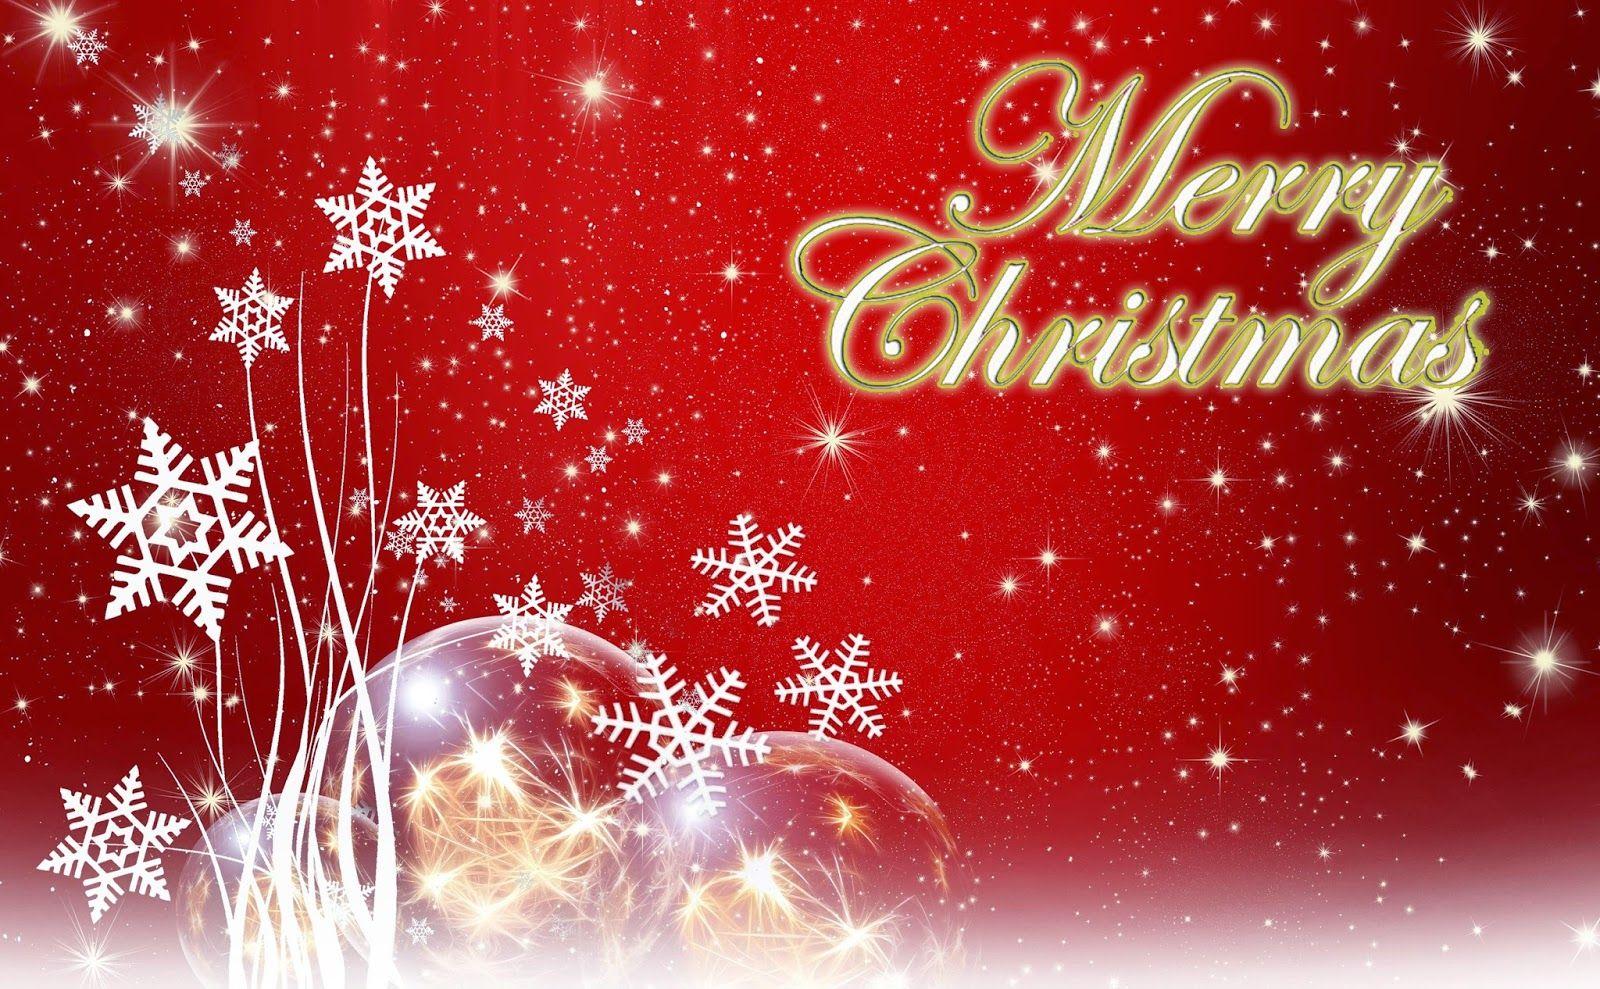 Christmas Greeting Cards And Christmas Cards Download Christmas